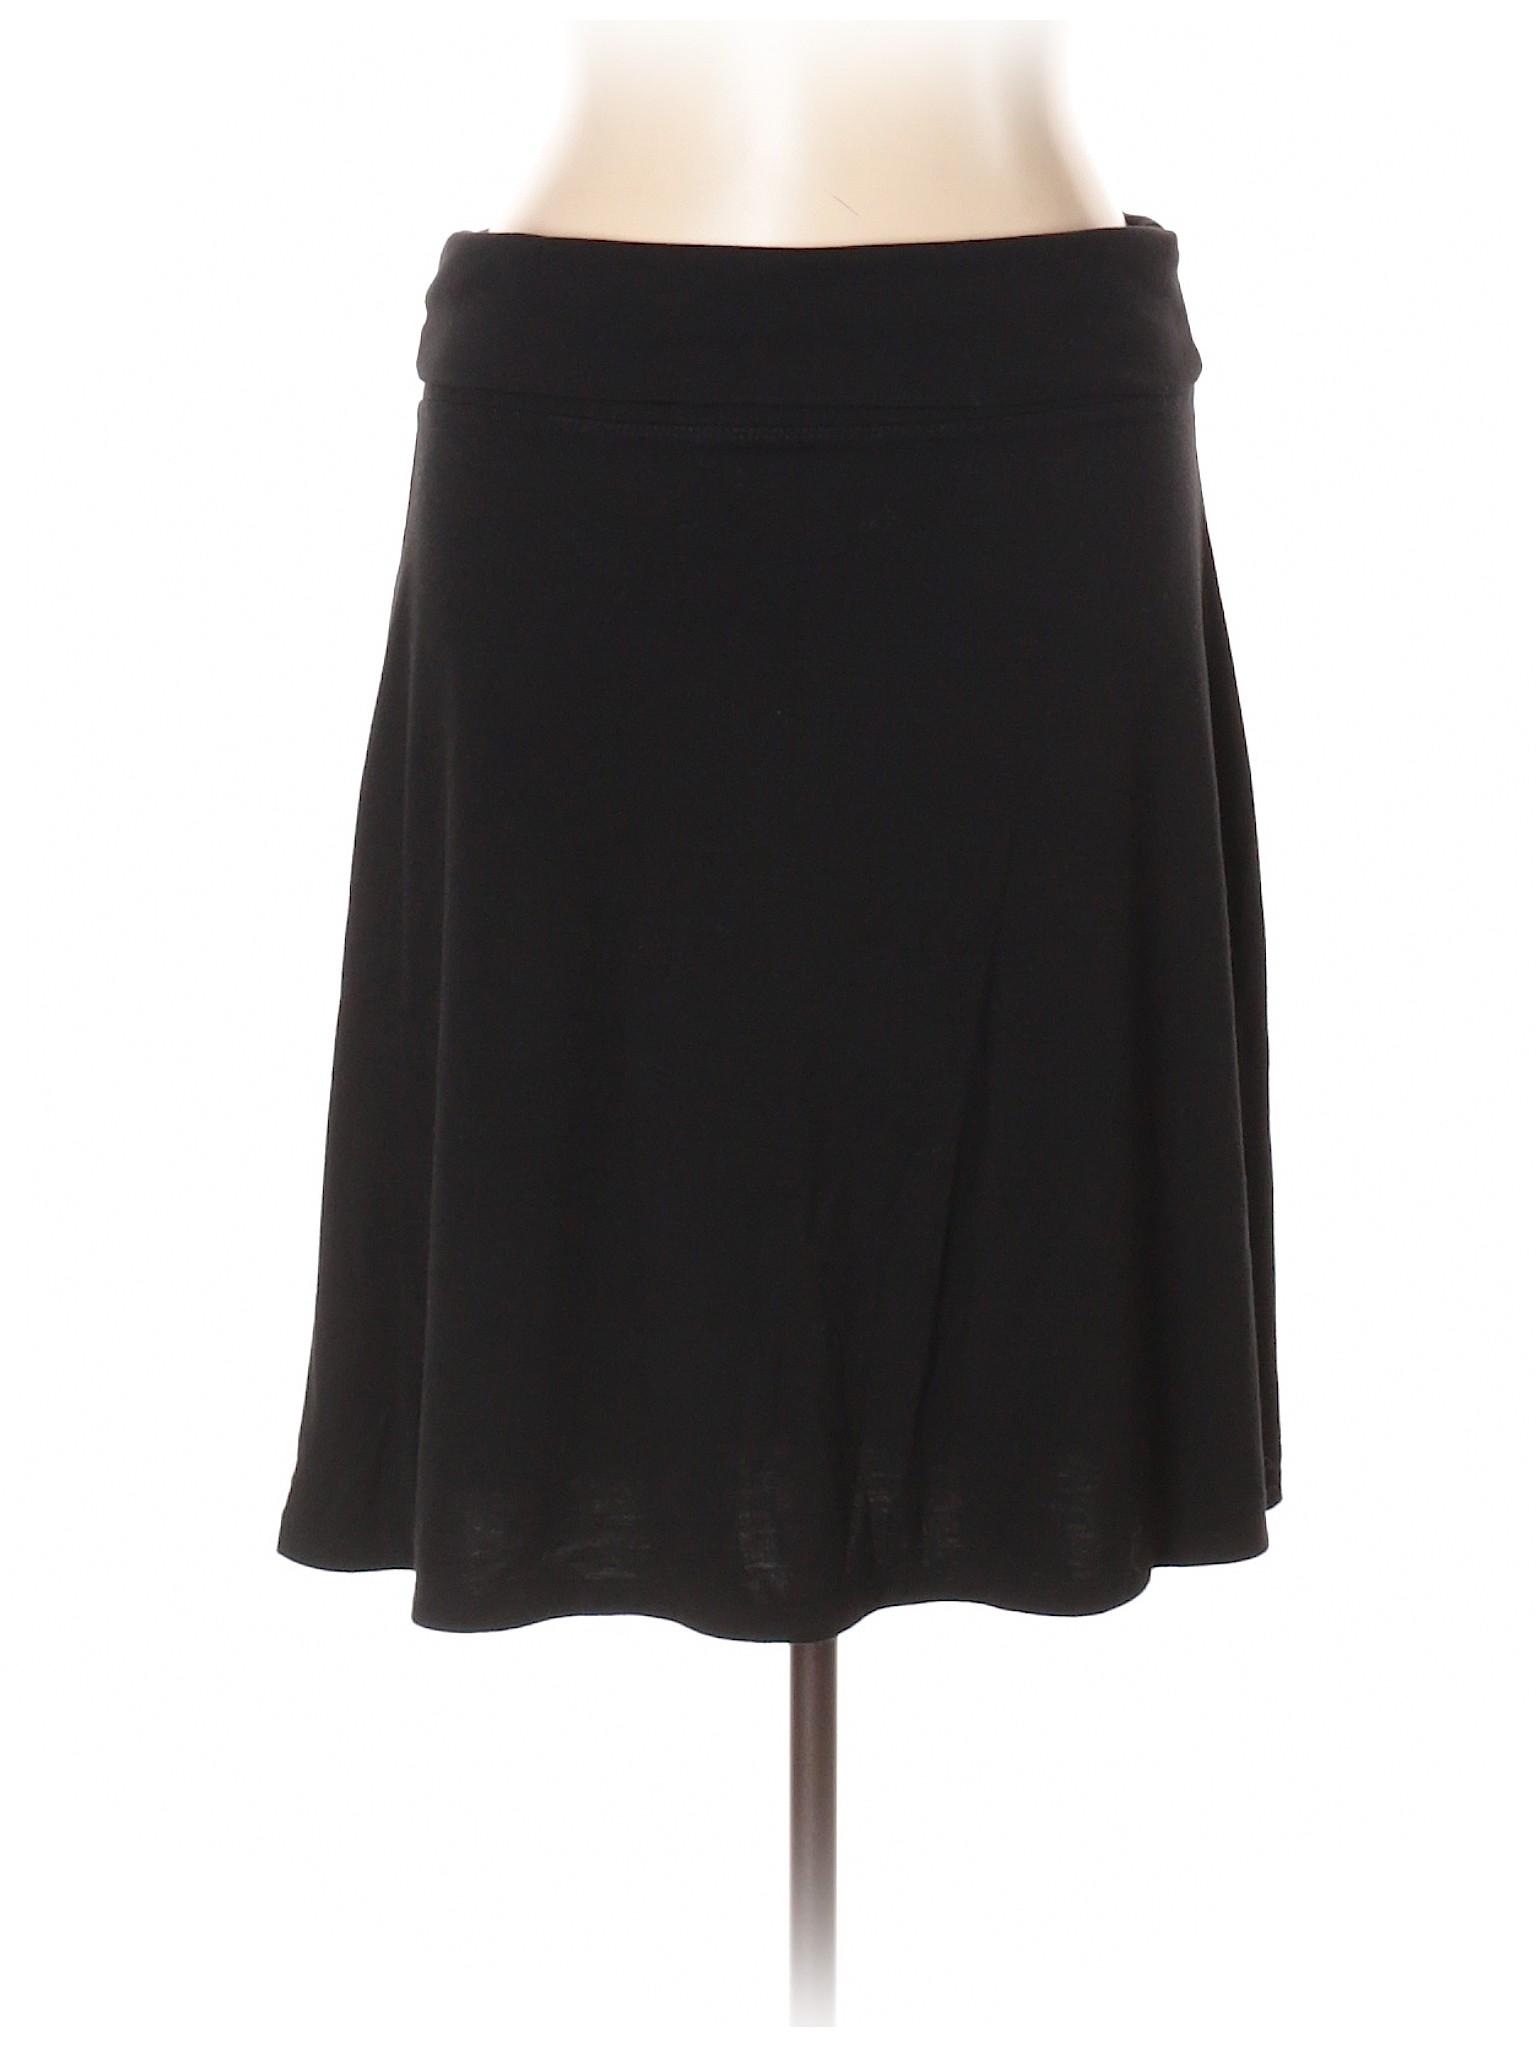 Boutique Boutique Boutique Casual Casual Casual Skirt Boutique Casual Skirt Skirt Casual Casual Skirt Skirt Boutique Boutique wqtg1O1Y